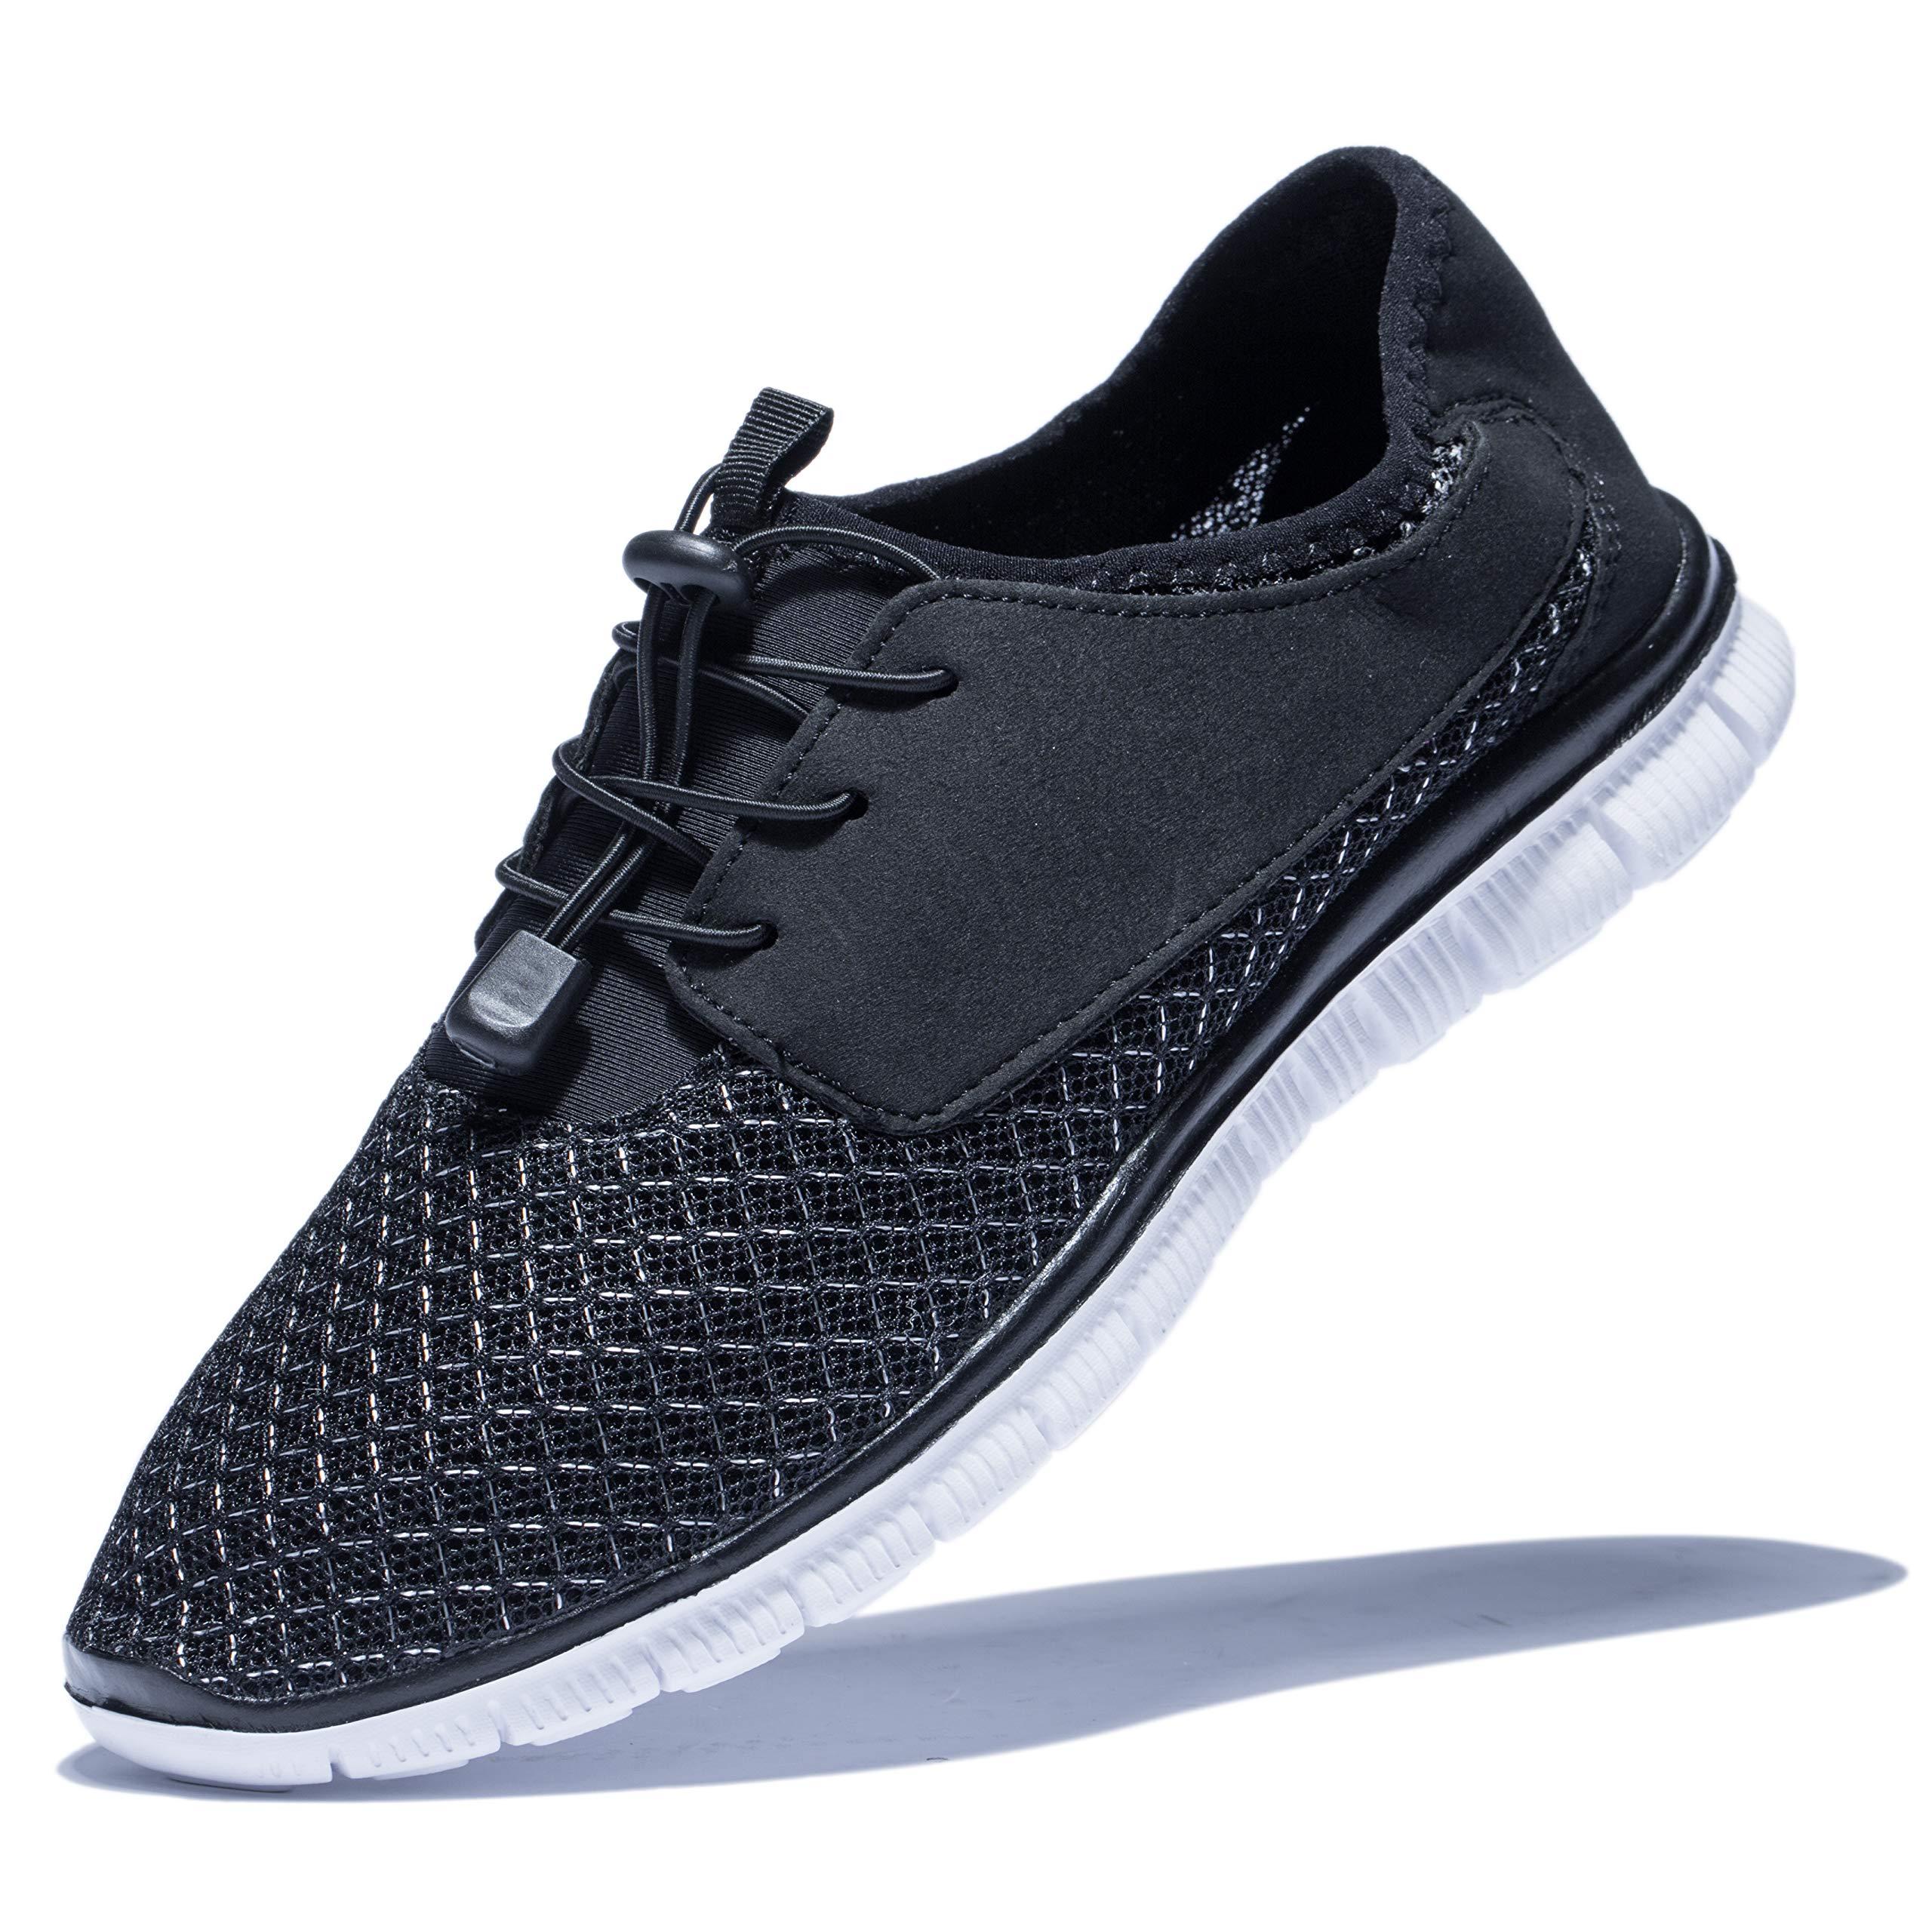 KENSBUY Men's Walking Sneakers Lightweight Mesh Lace Up Shoes(Black EU41) by KENSBUY (Image #1)